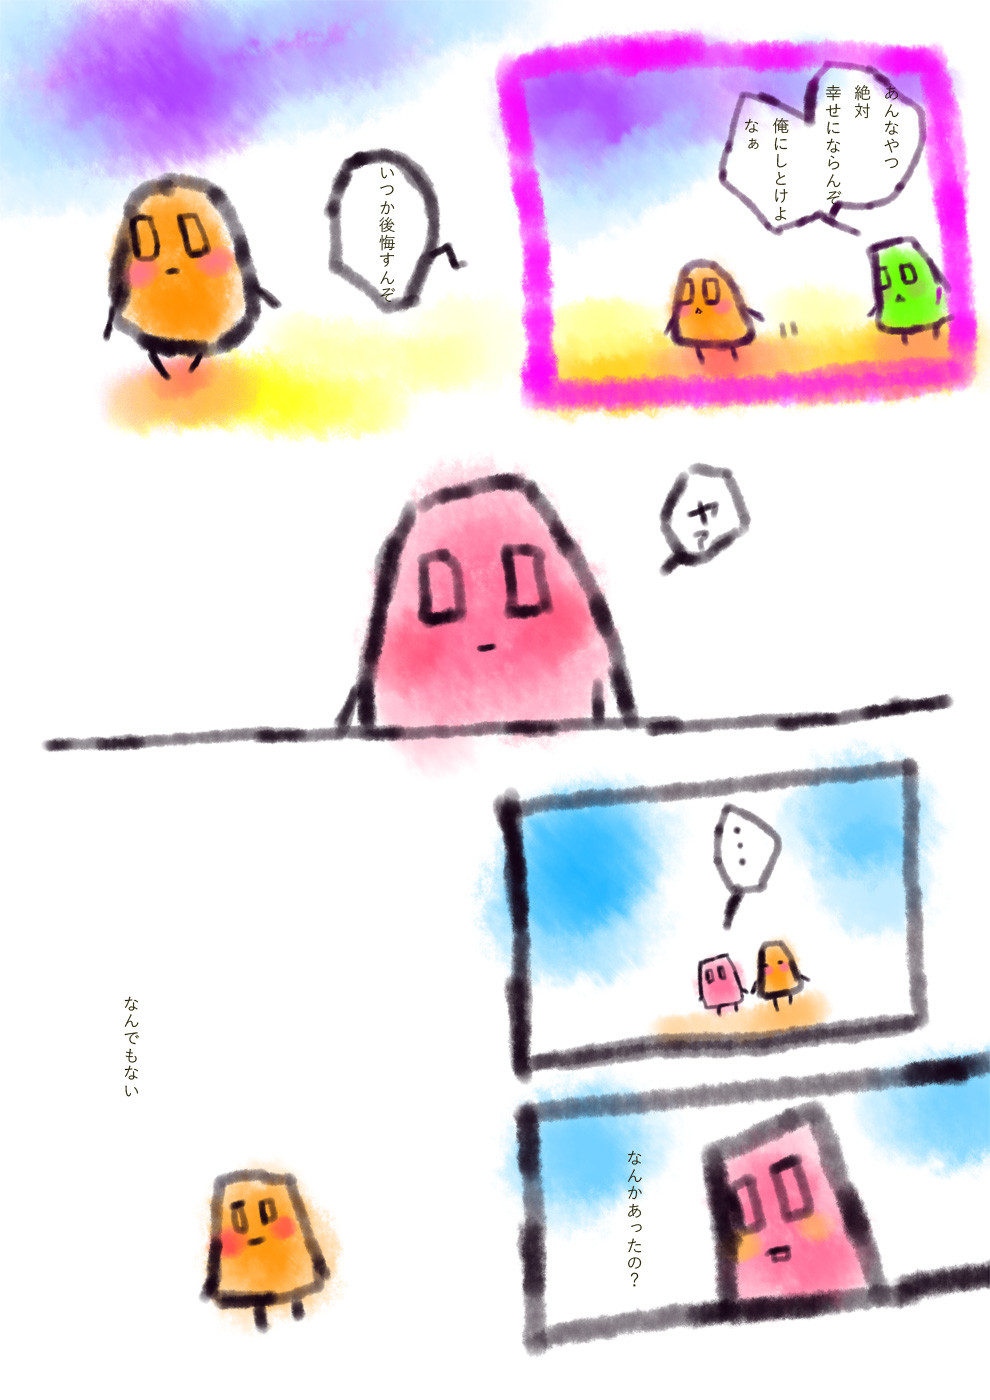 http://ahito.com/comic/short/nega/img/2018/20180320/01.jpg